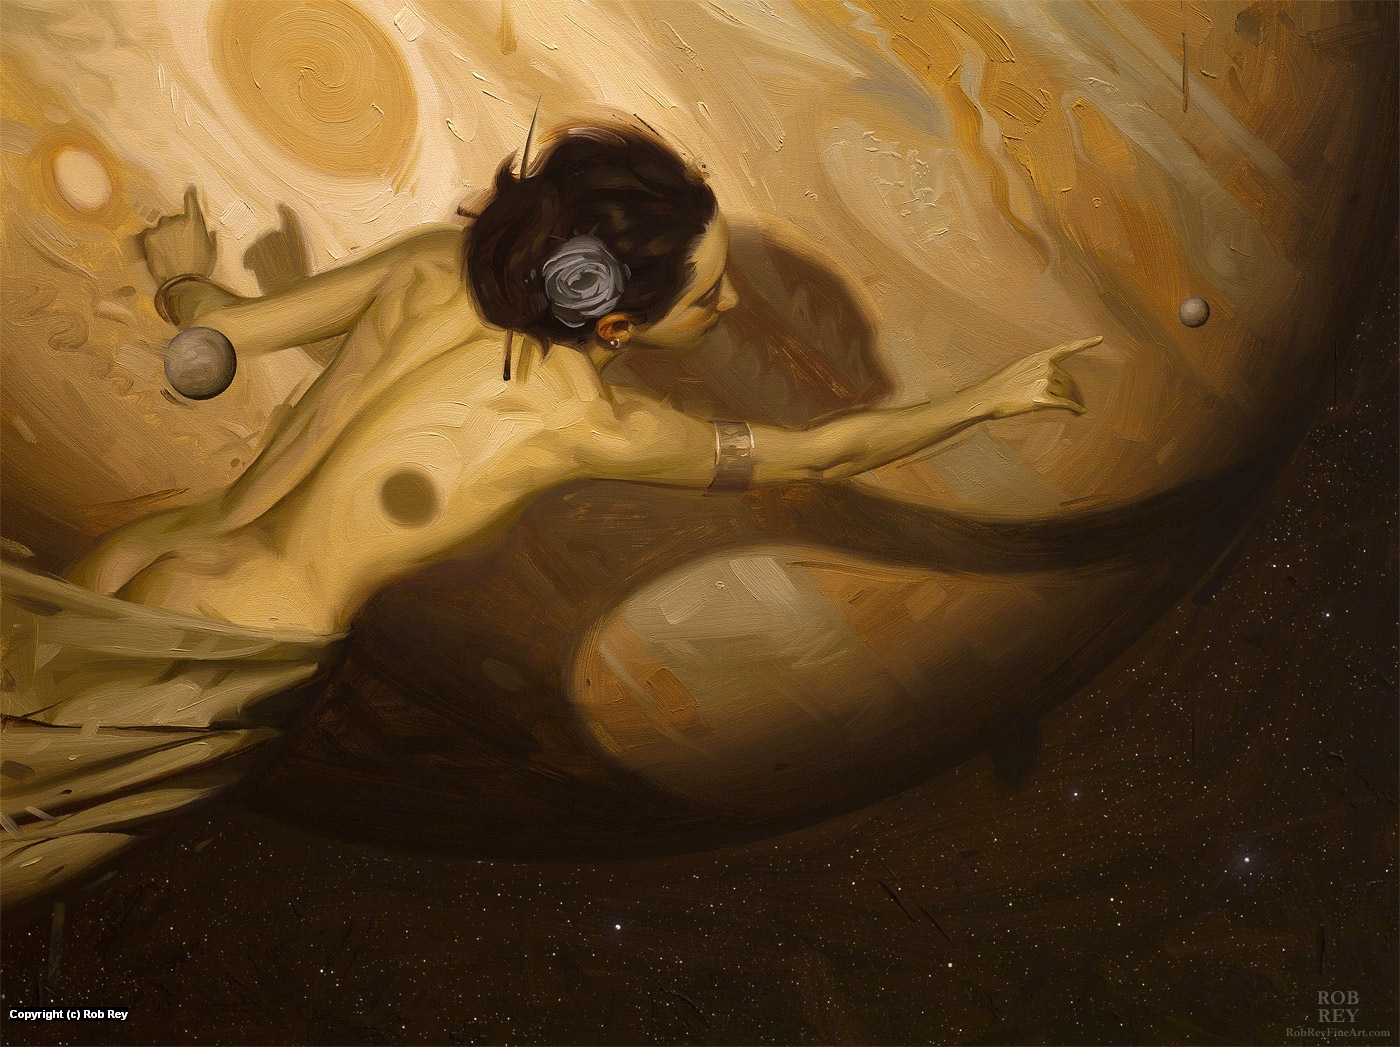 Reaching Europa Artwork by Rob Rey